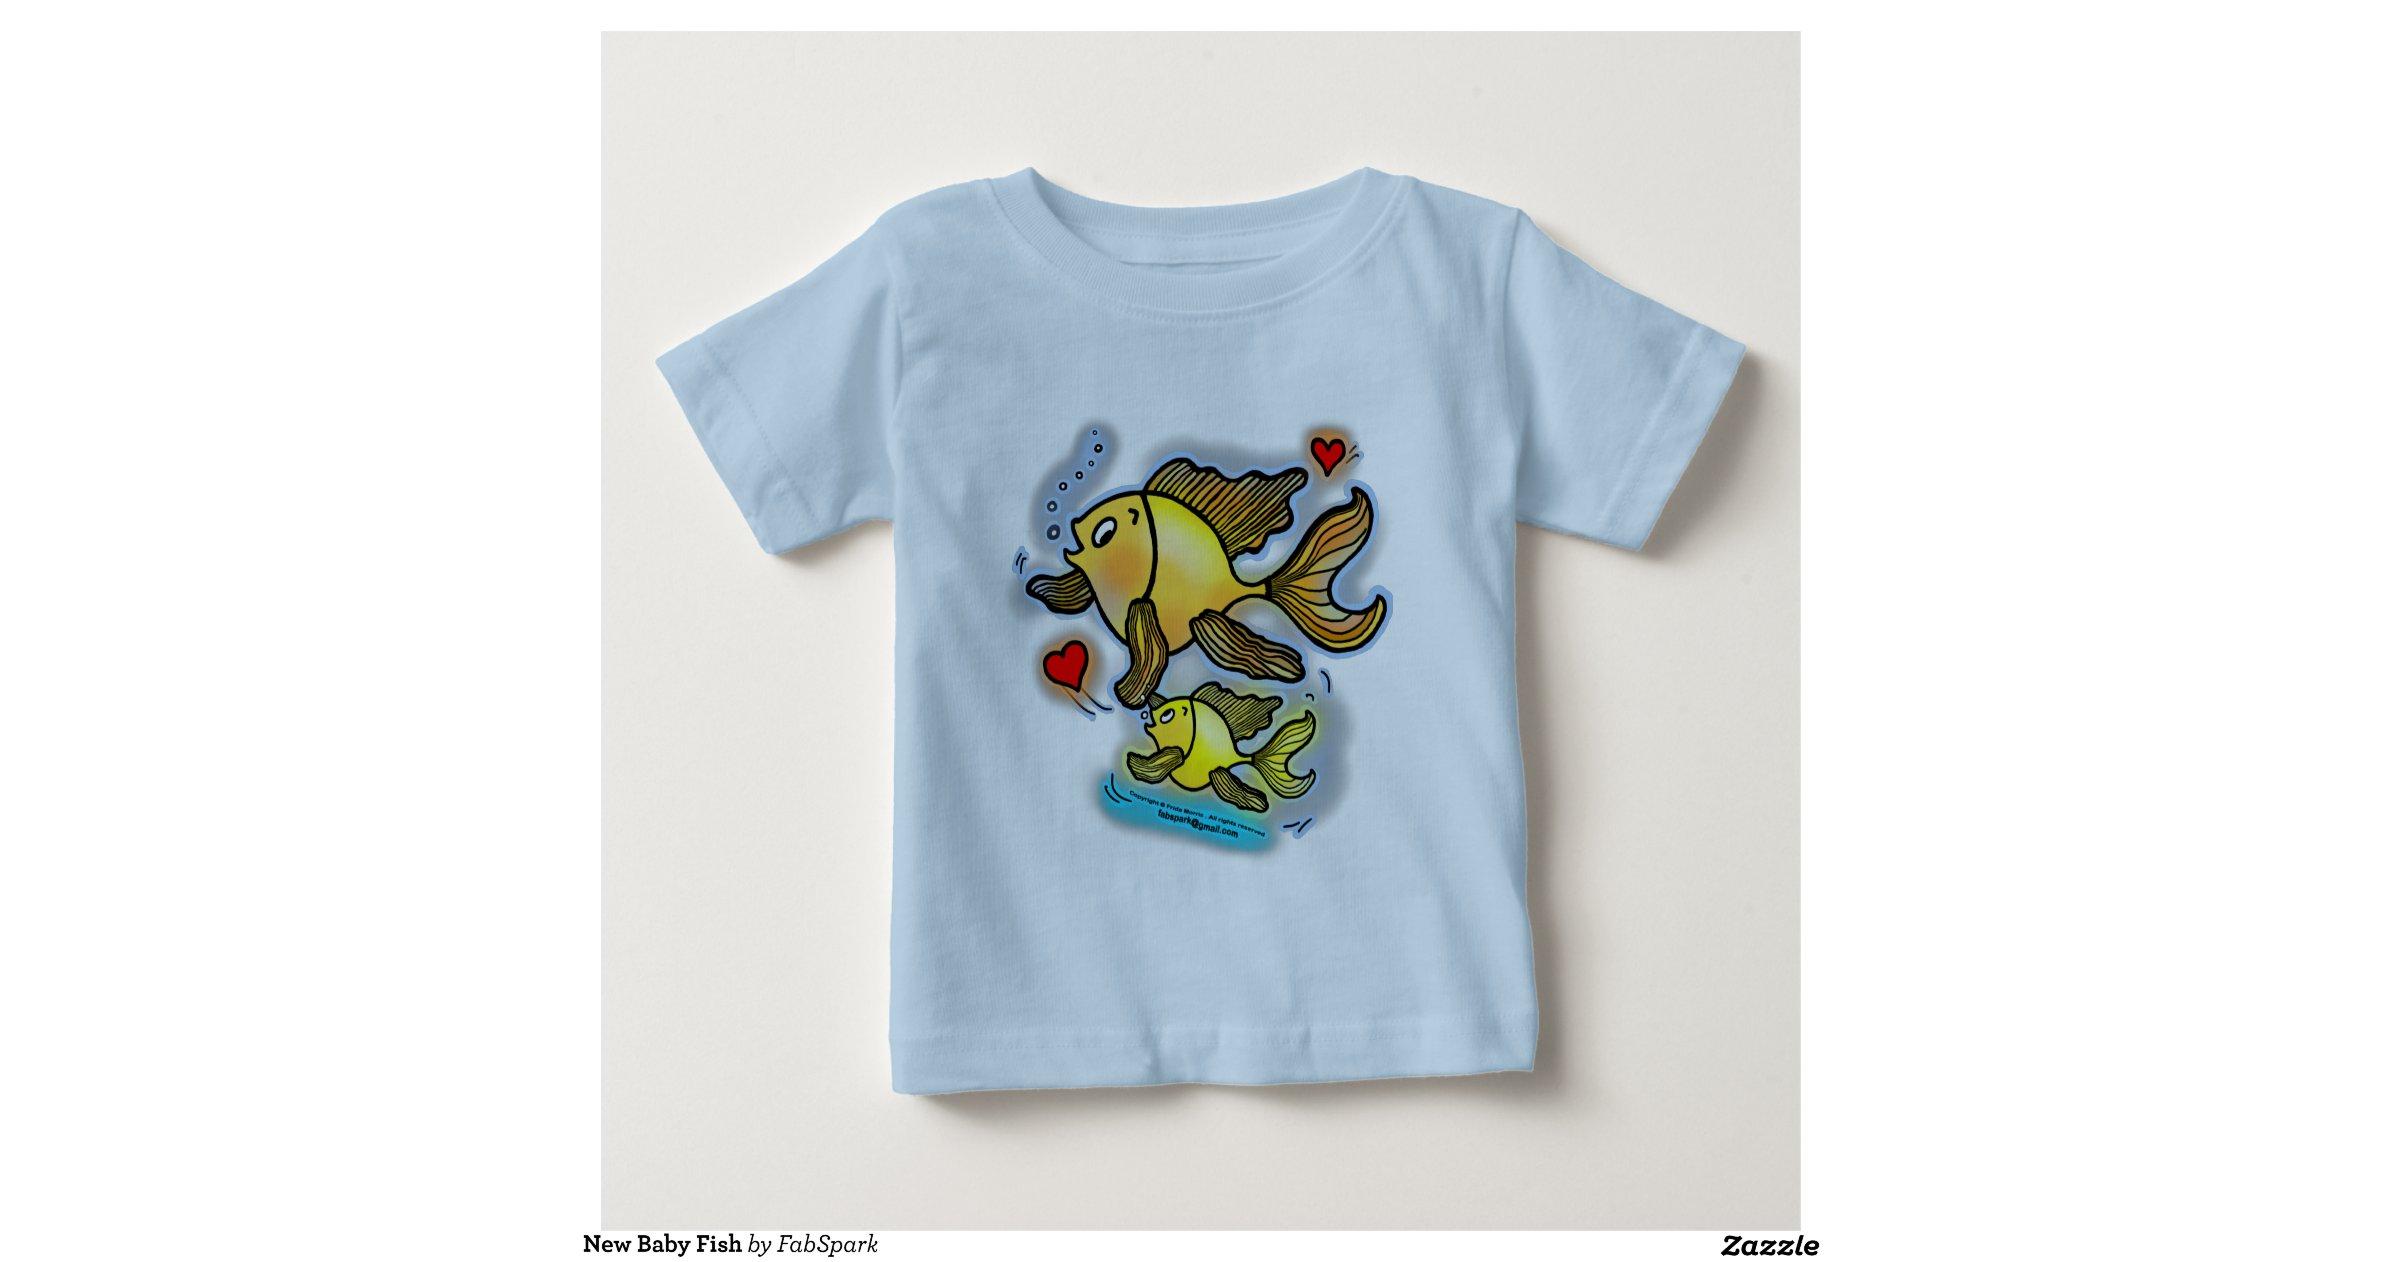 New baby fish t shirt zazzle for Baby fishing shirts